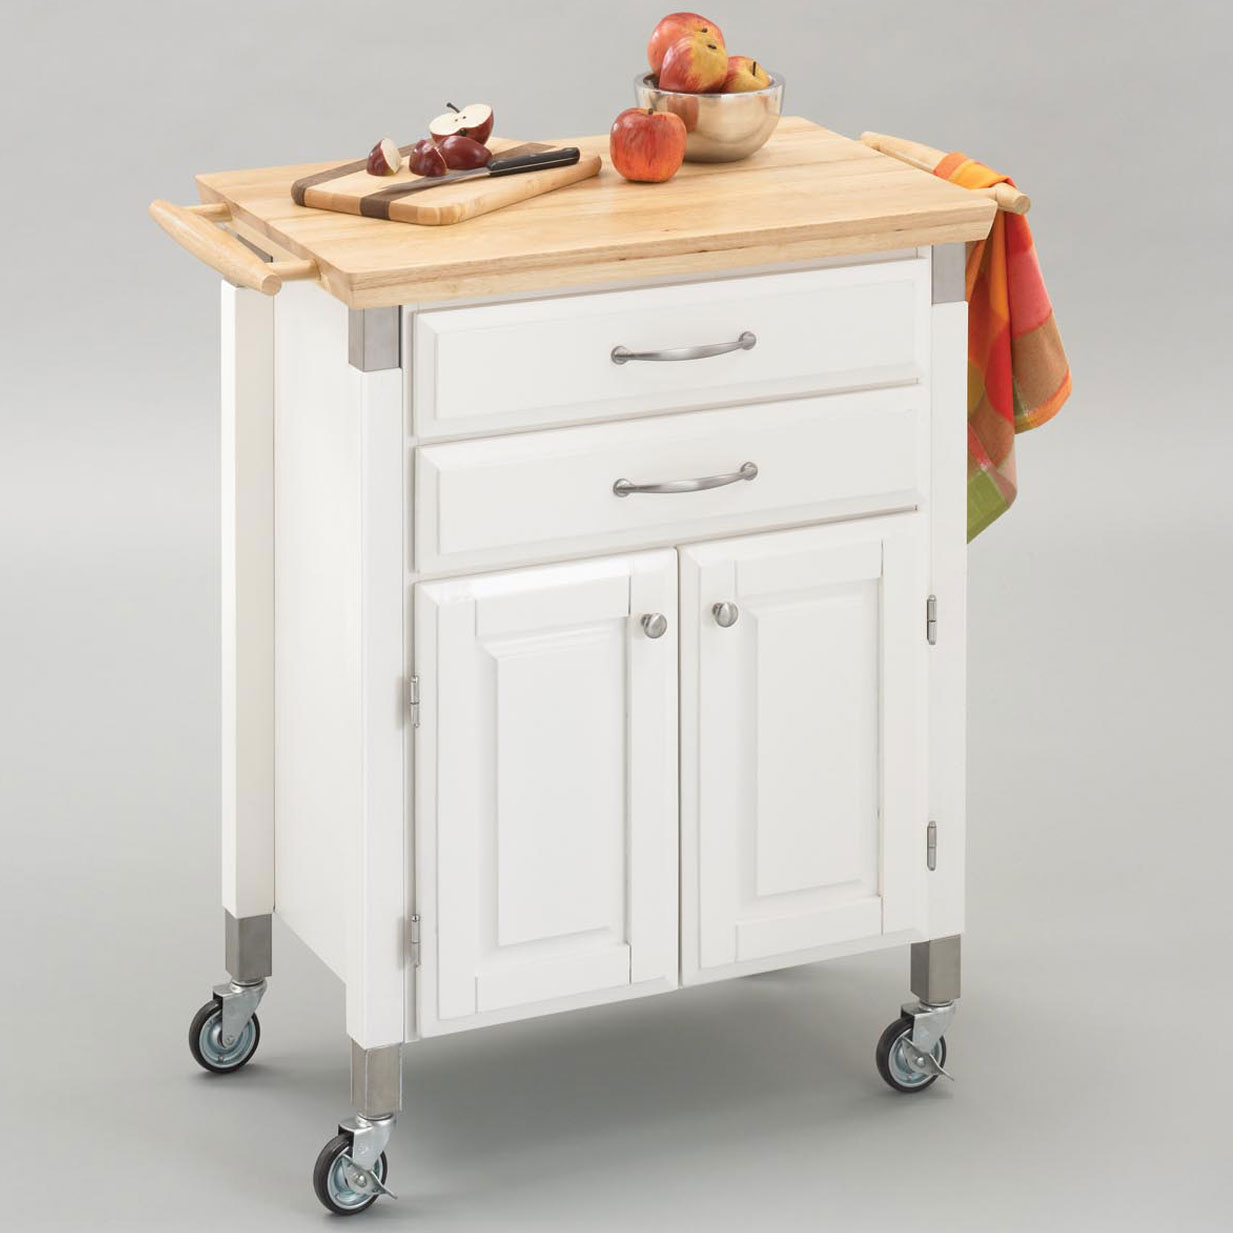 Brylane Home Kitchen: Dolly Madison Prep & Serve Cart